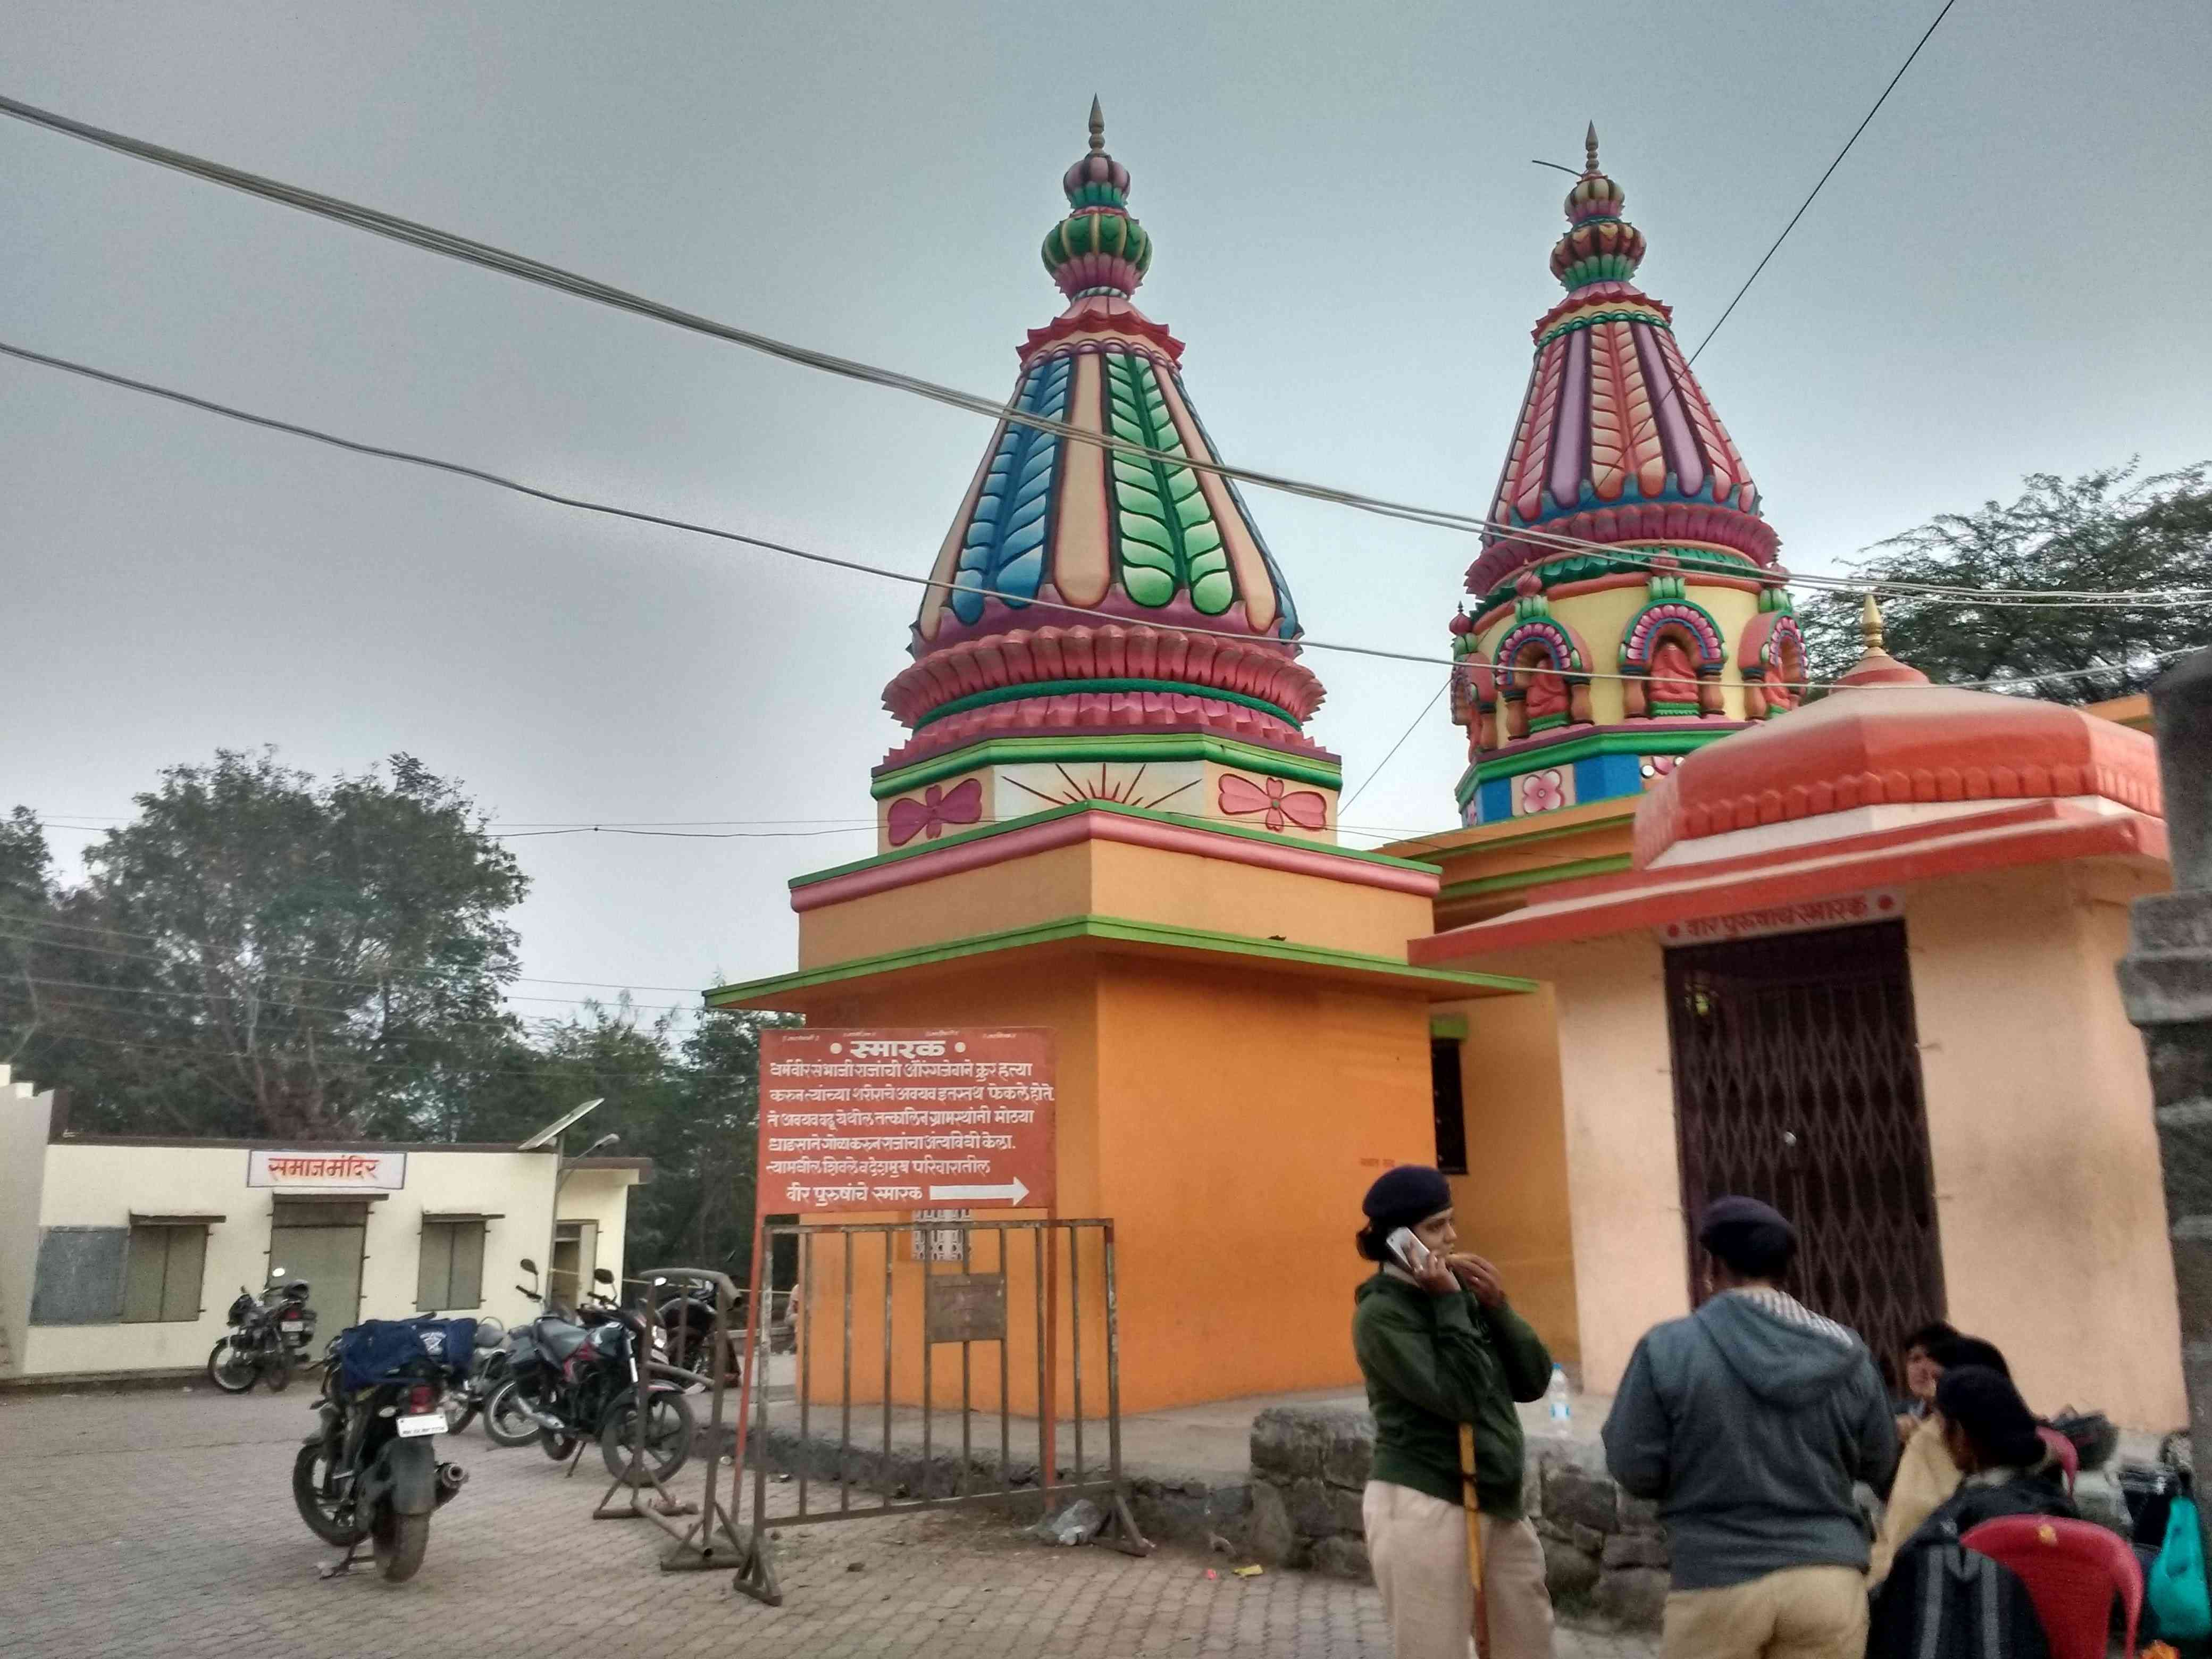 The board just outside Sambhaji's samadhi was heavily guarded on January 2, 2018. Photo: Mridula Chari